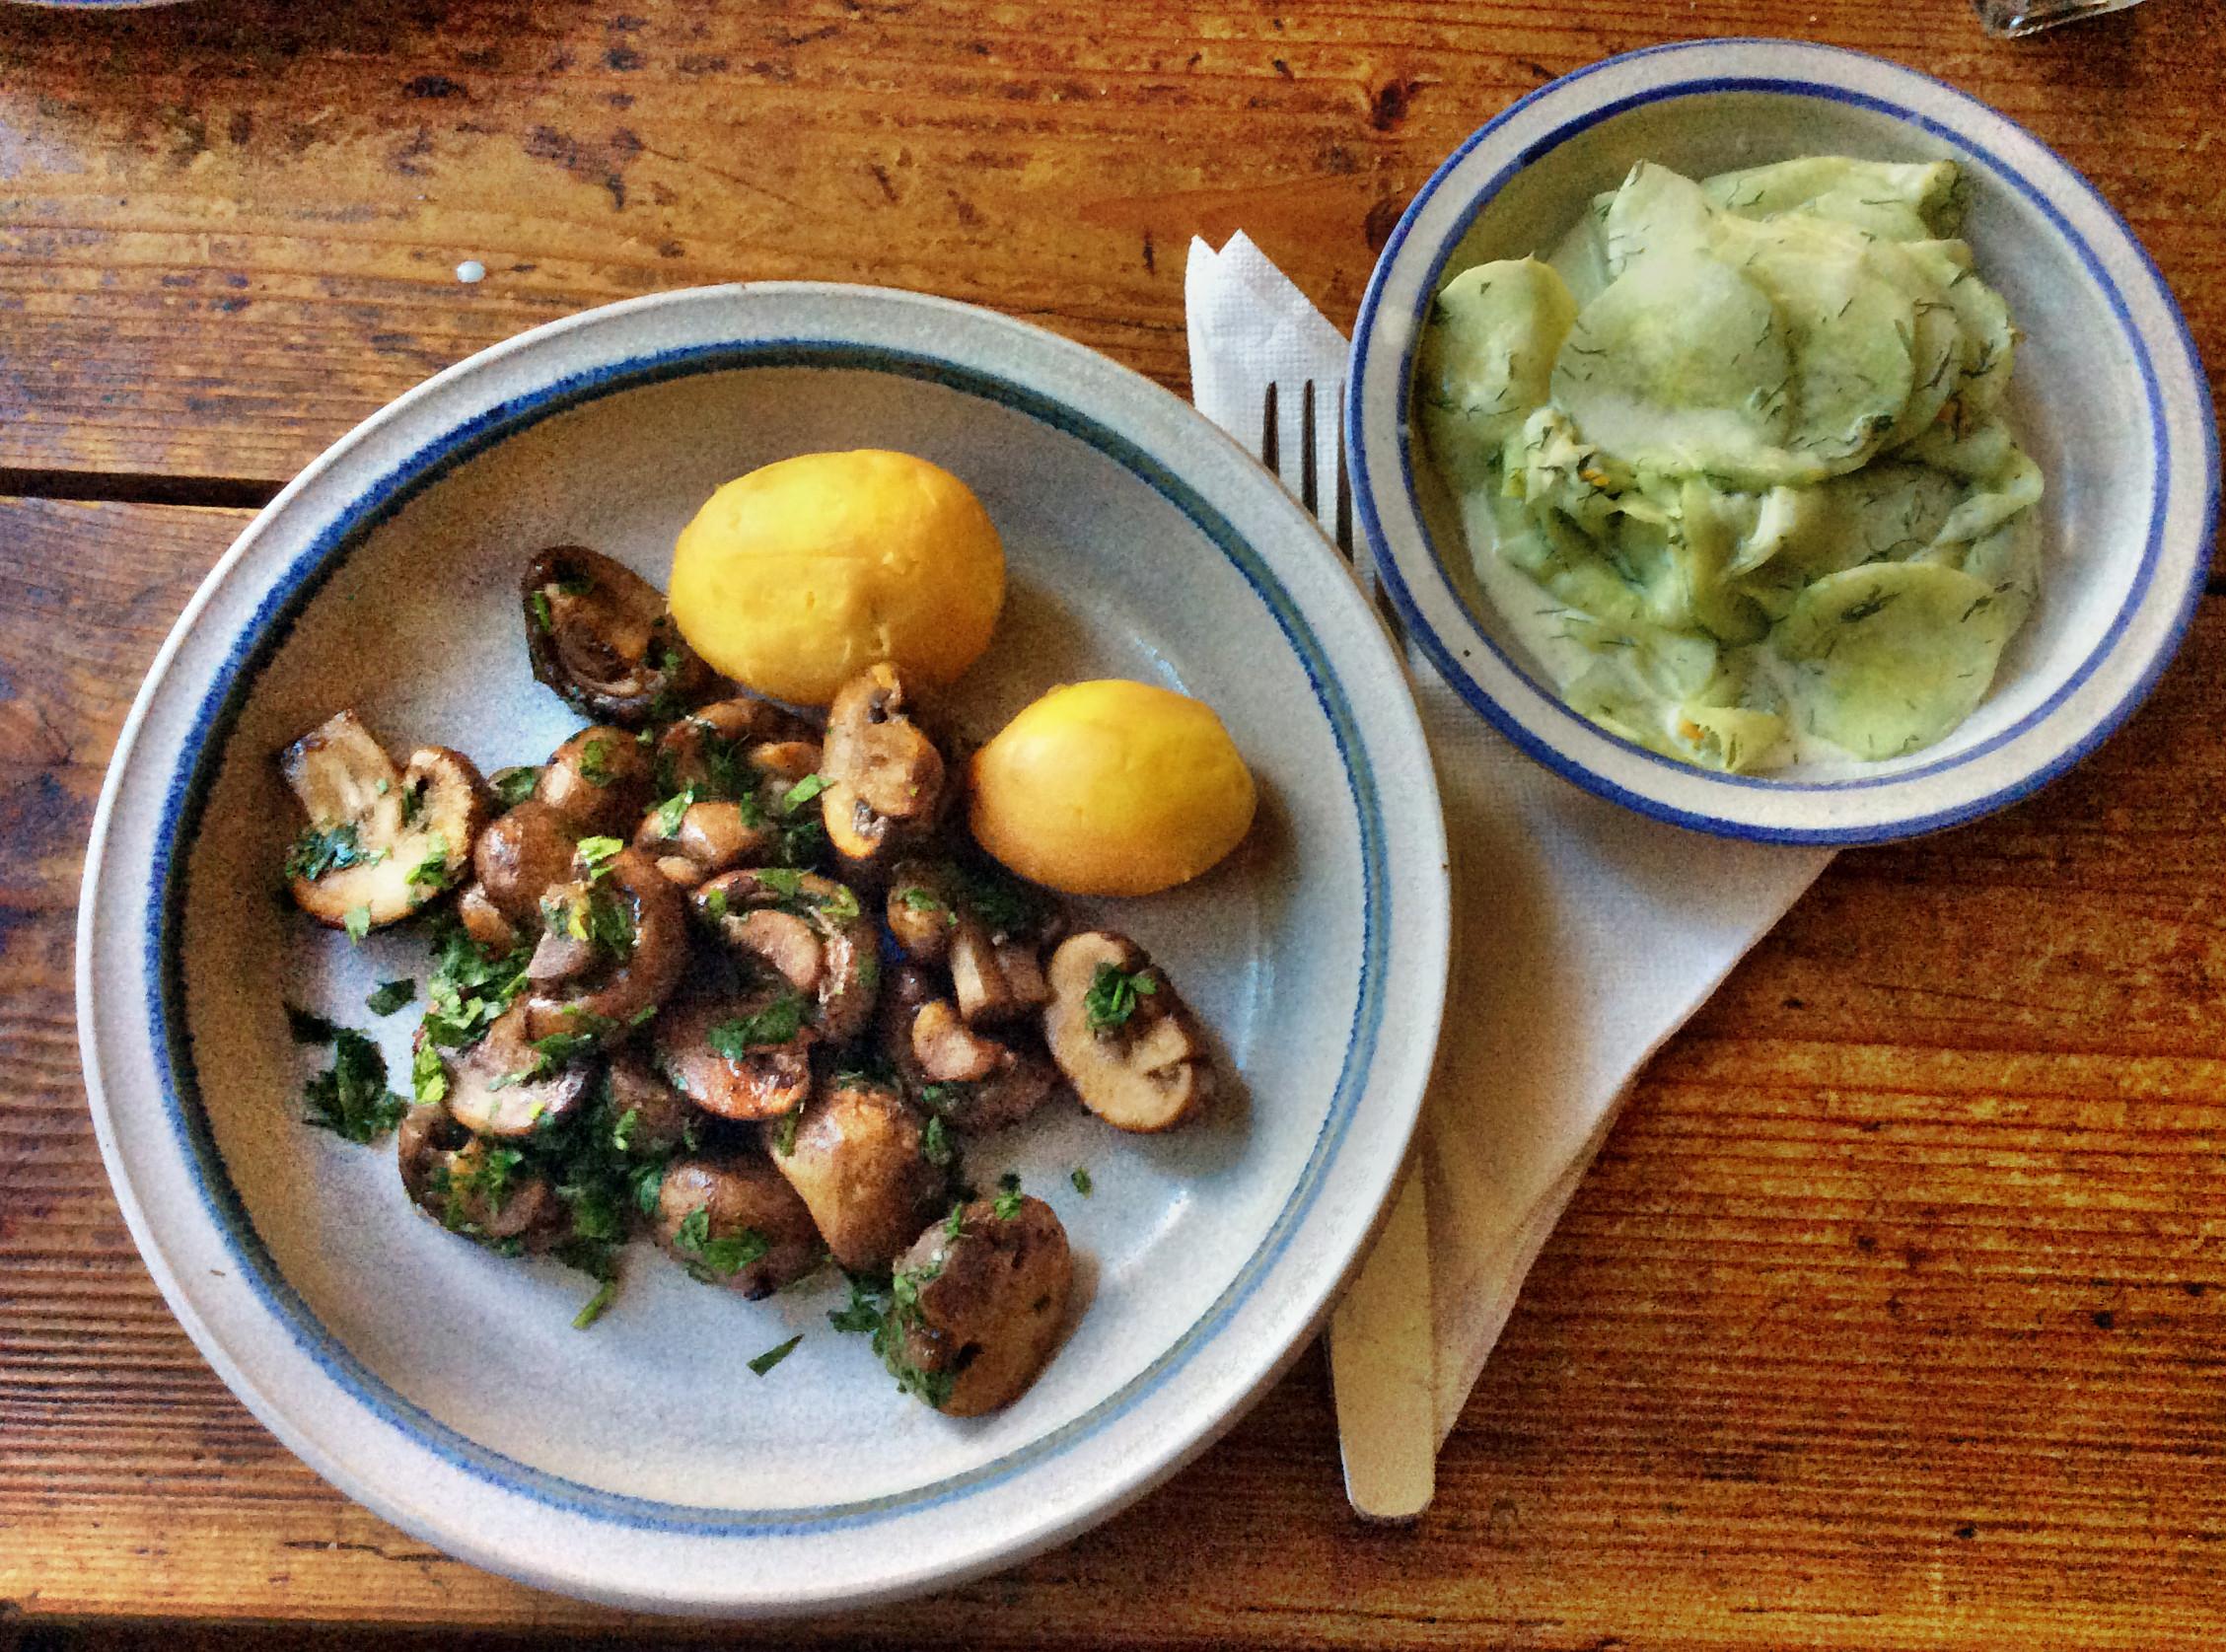 Champignon,Kartoffeln,Dessert -16.11.15   (1)